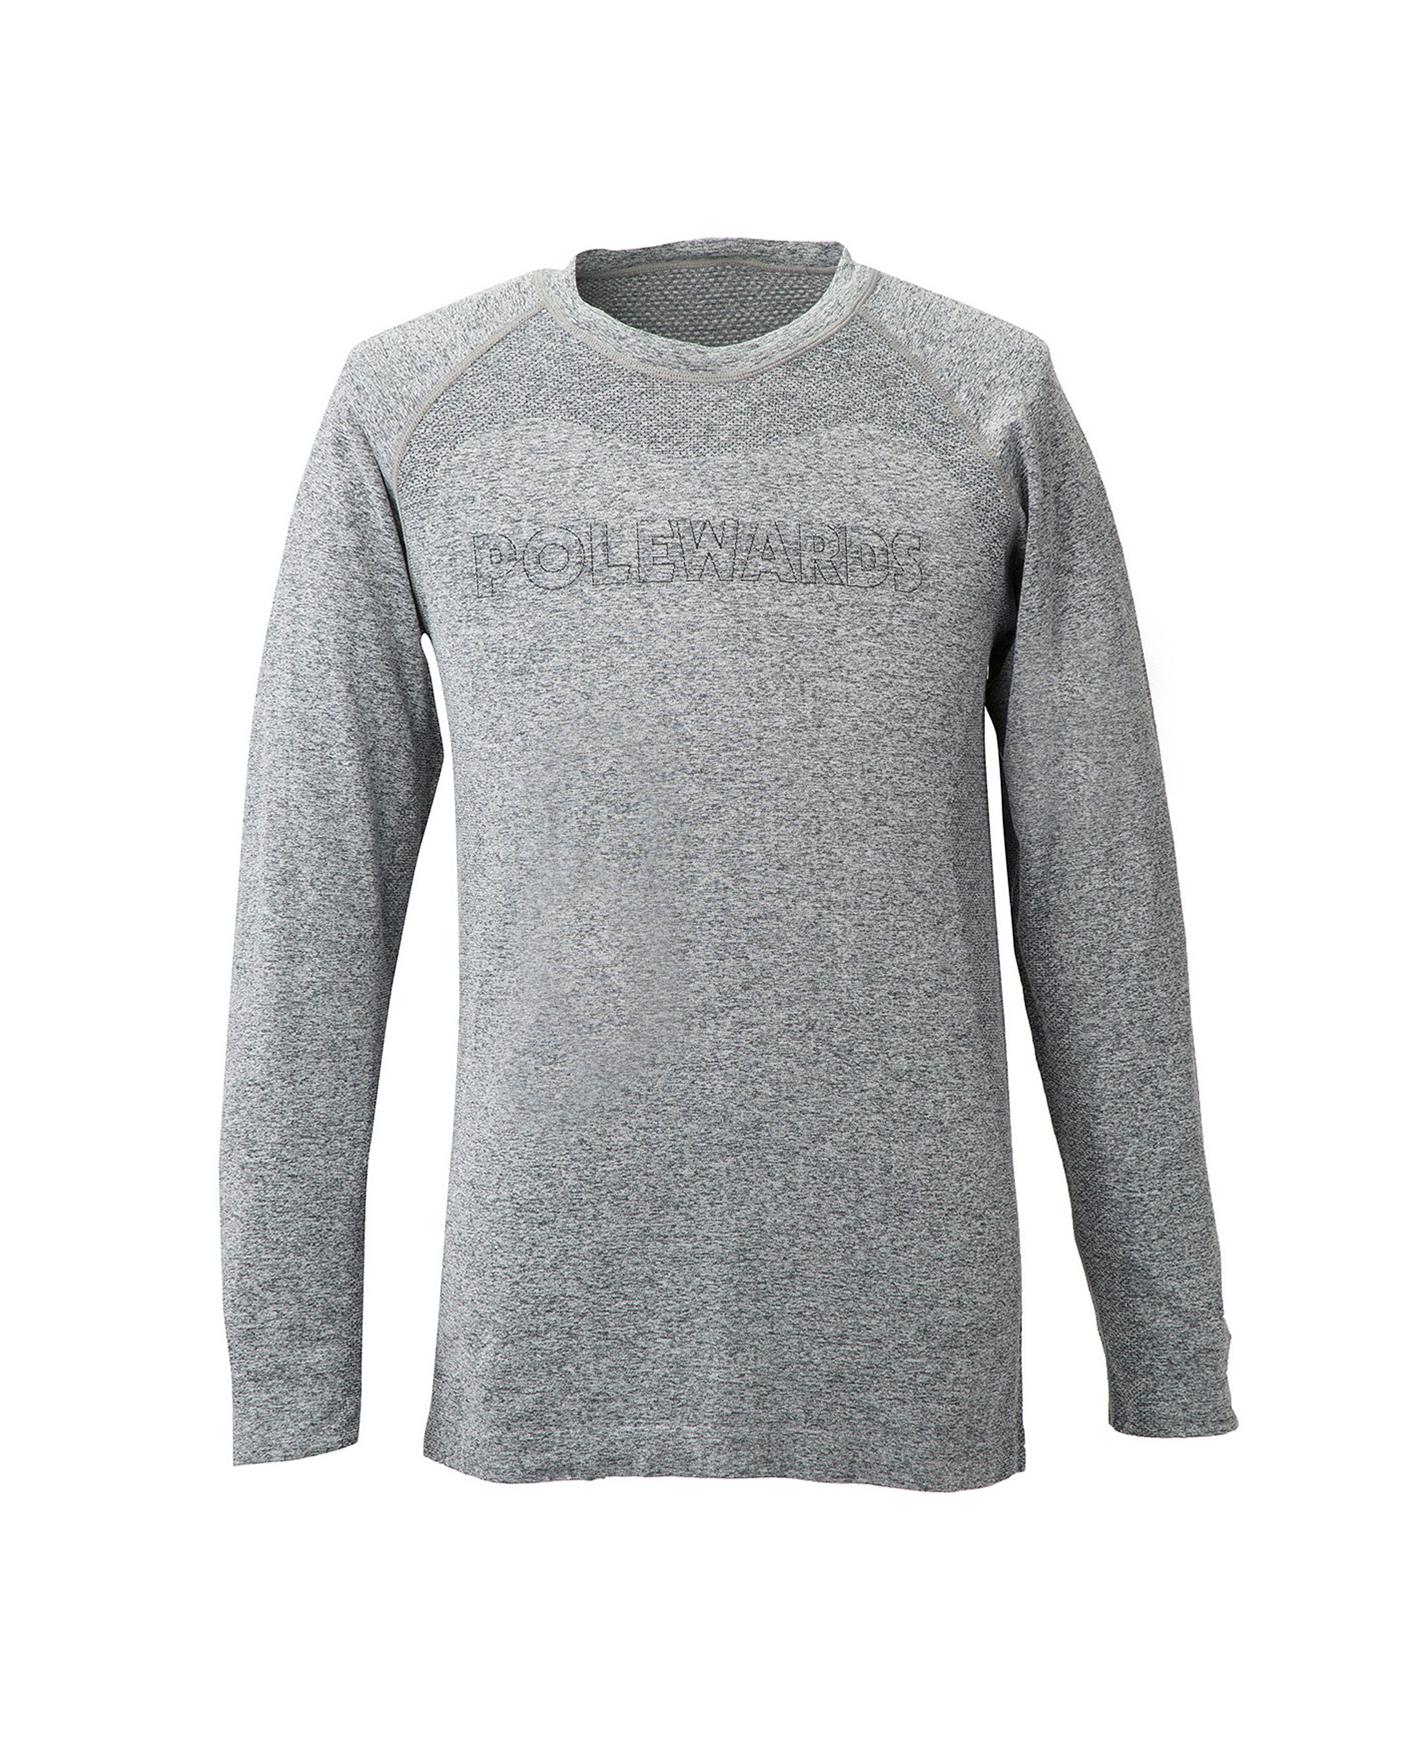 Seamless Crew Neck Tshirt L/S(シームレス クルーネックTシャツ)